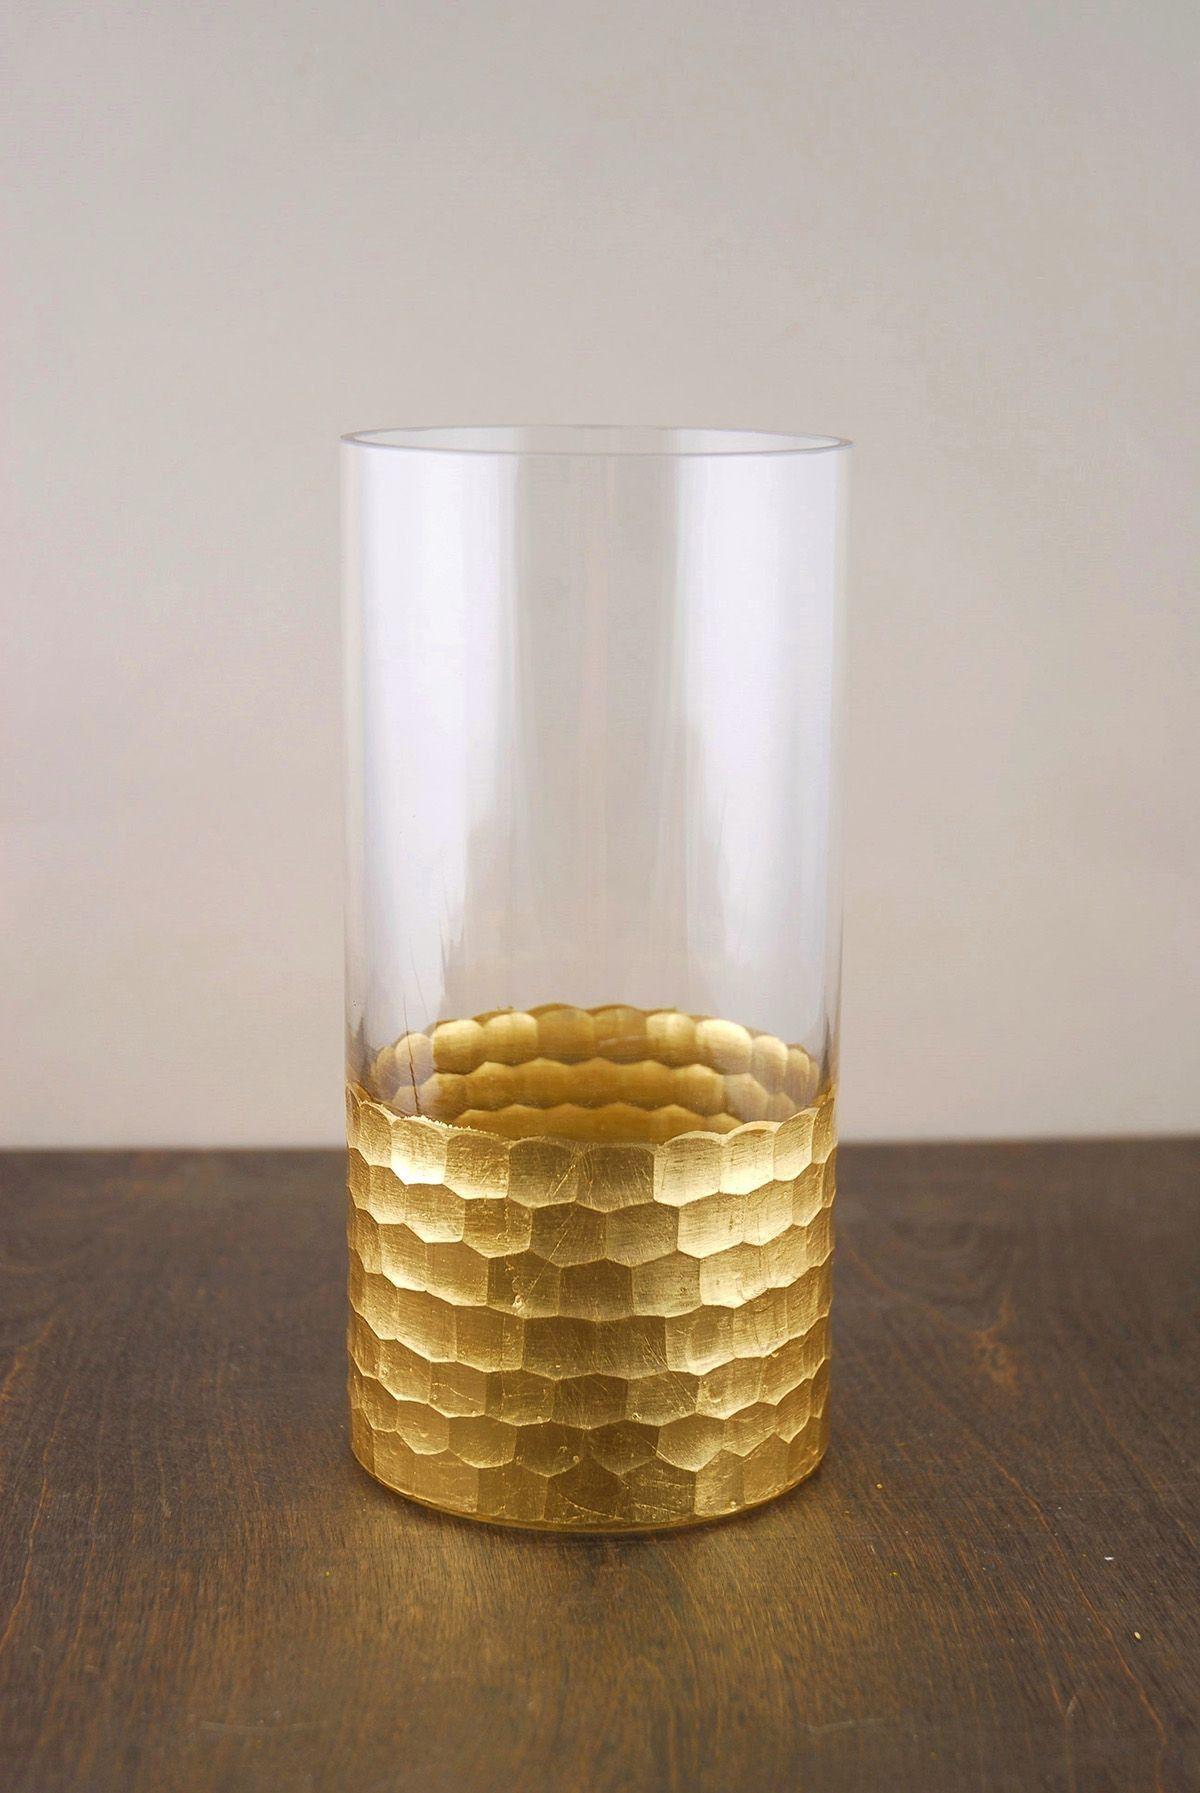 8 glass cylinder vase of gold mercury glass vases inspirational gold cylinder vases throughout gold mercury glass vases inspirational gold cylinder vases collection silver and gold mercury glass mosaic